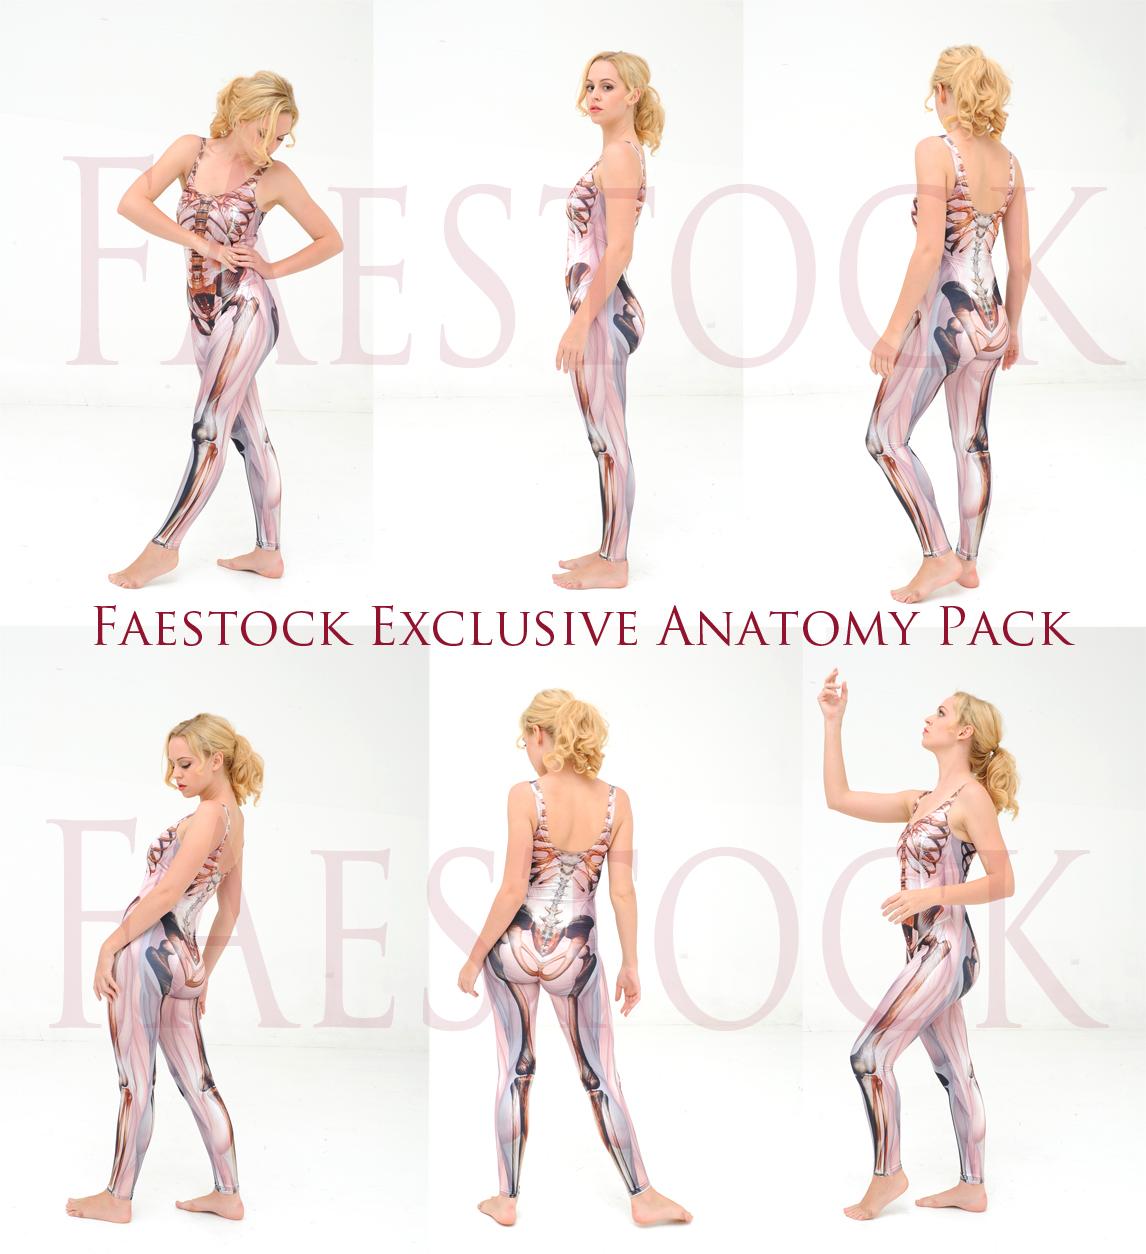 Faestock Exclusive Anatomy Pack